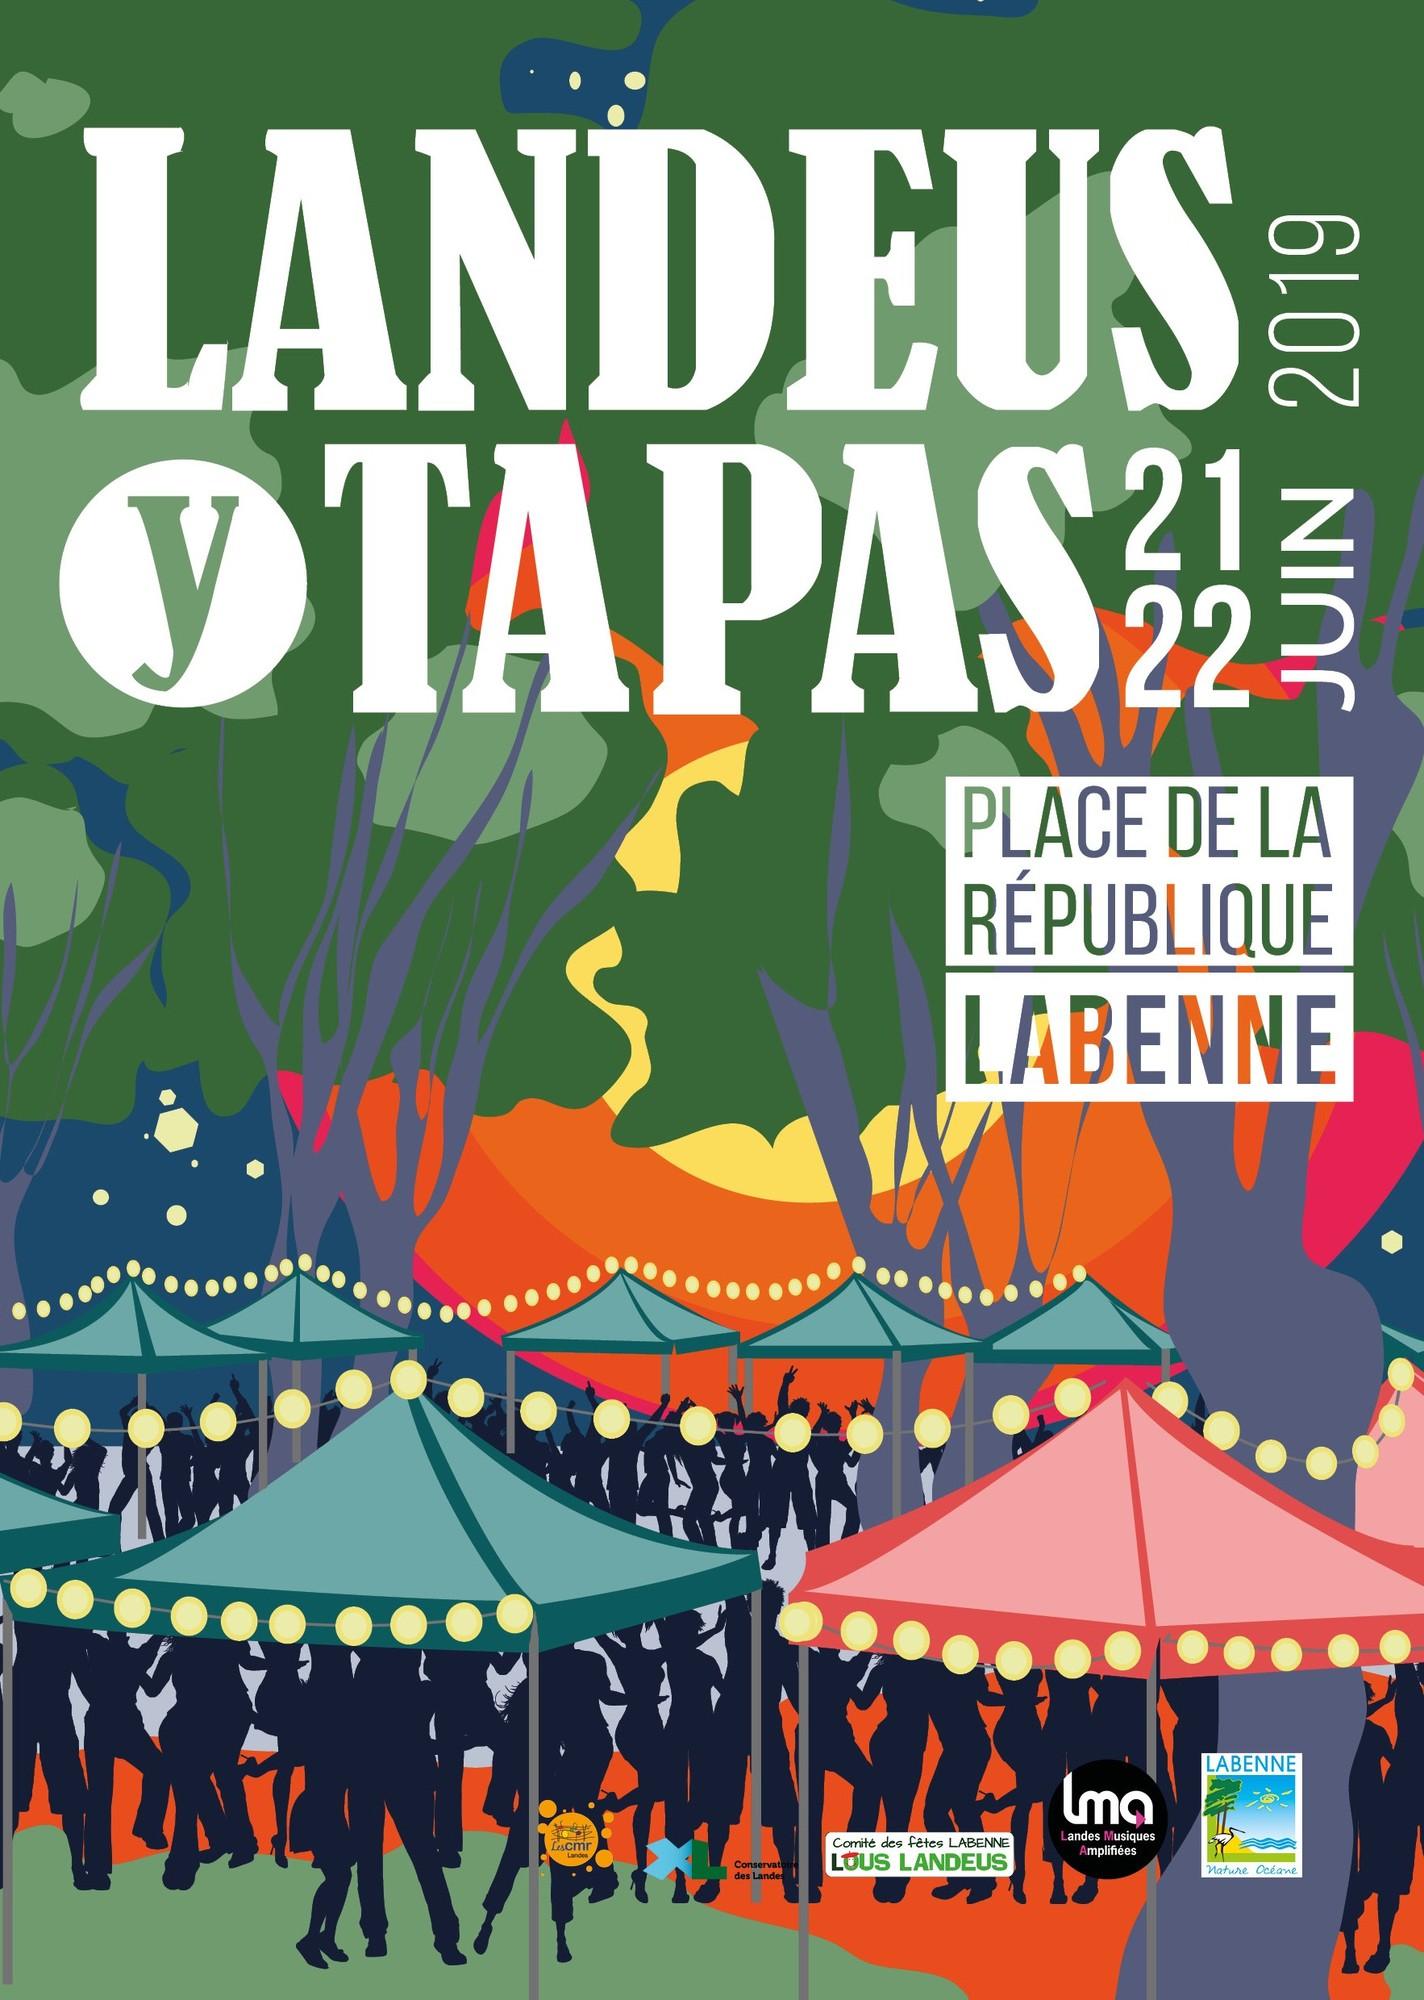 Casetas Labenne- Landeus y tapas 2019